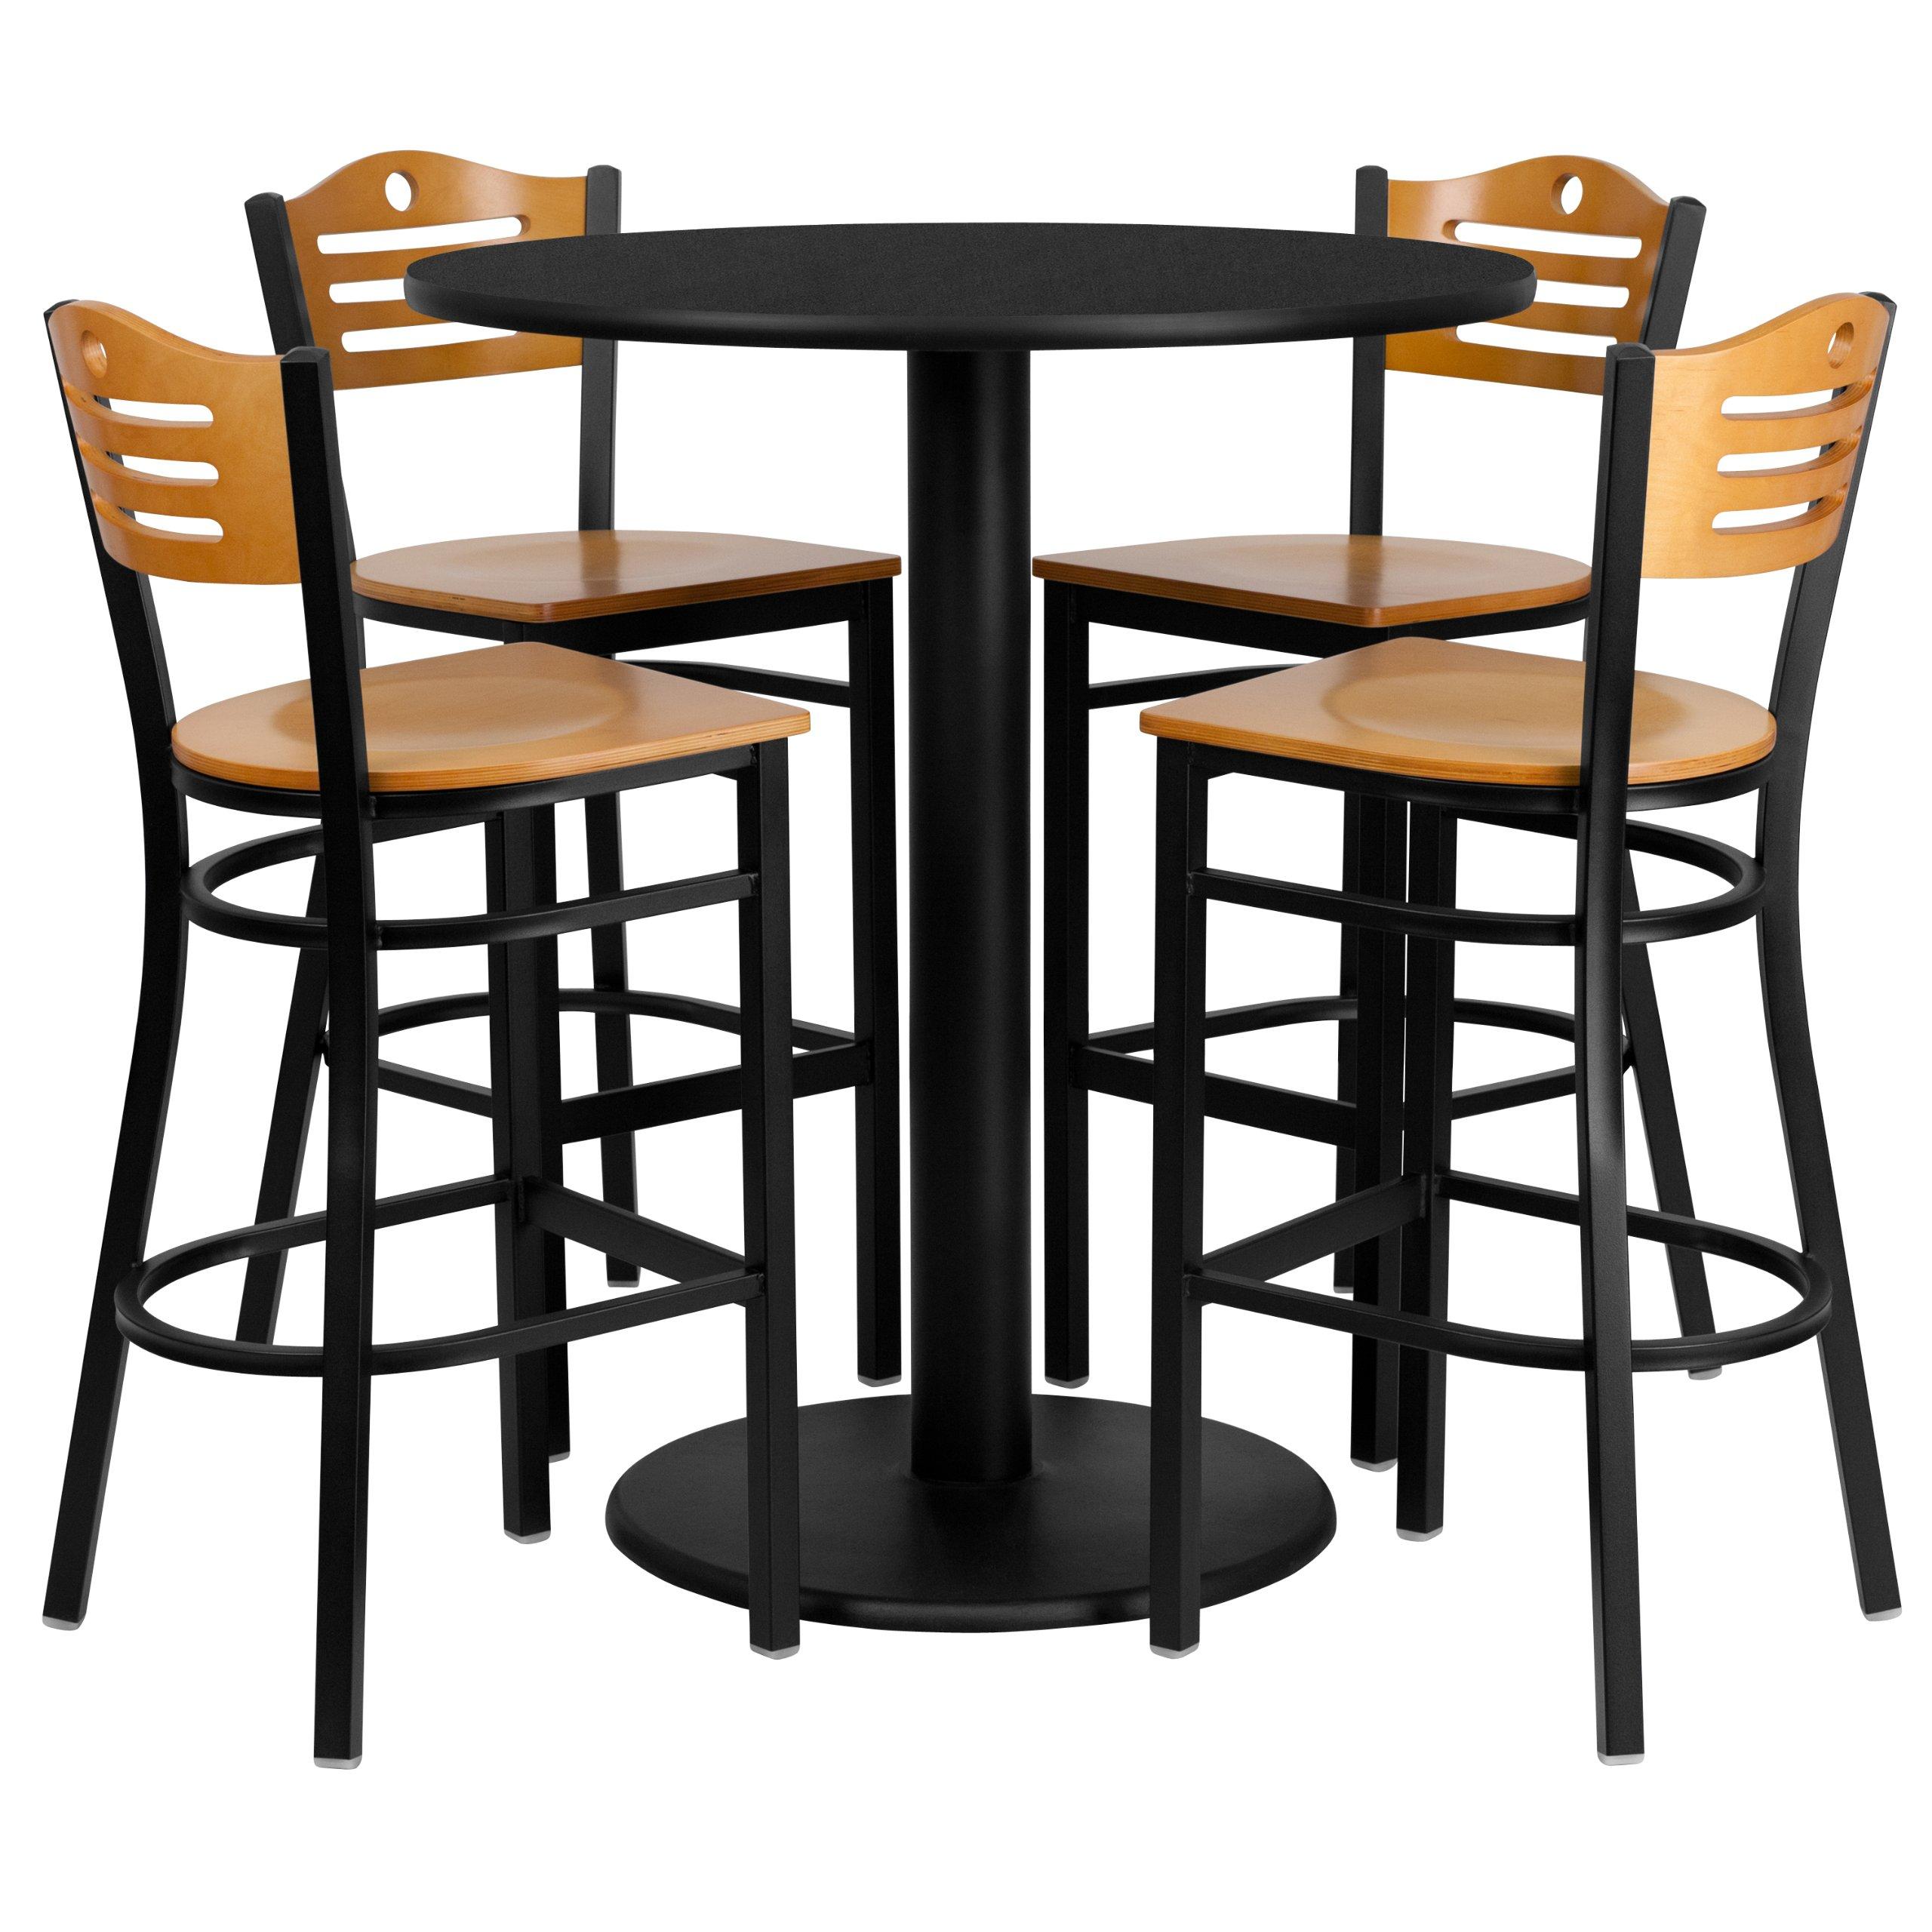 Flash Furniture 36'' Round Black Laminate Table Set with 4 Wood Slat Back Metal Barstools - Natural Wood Seat